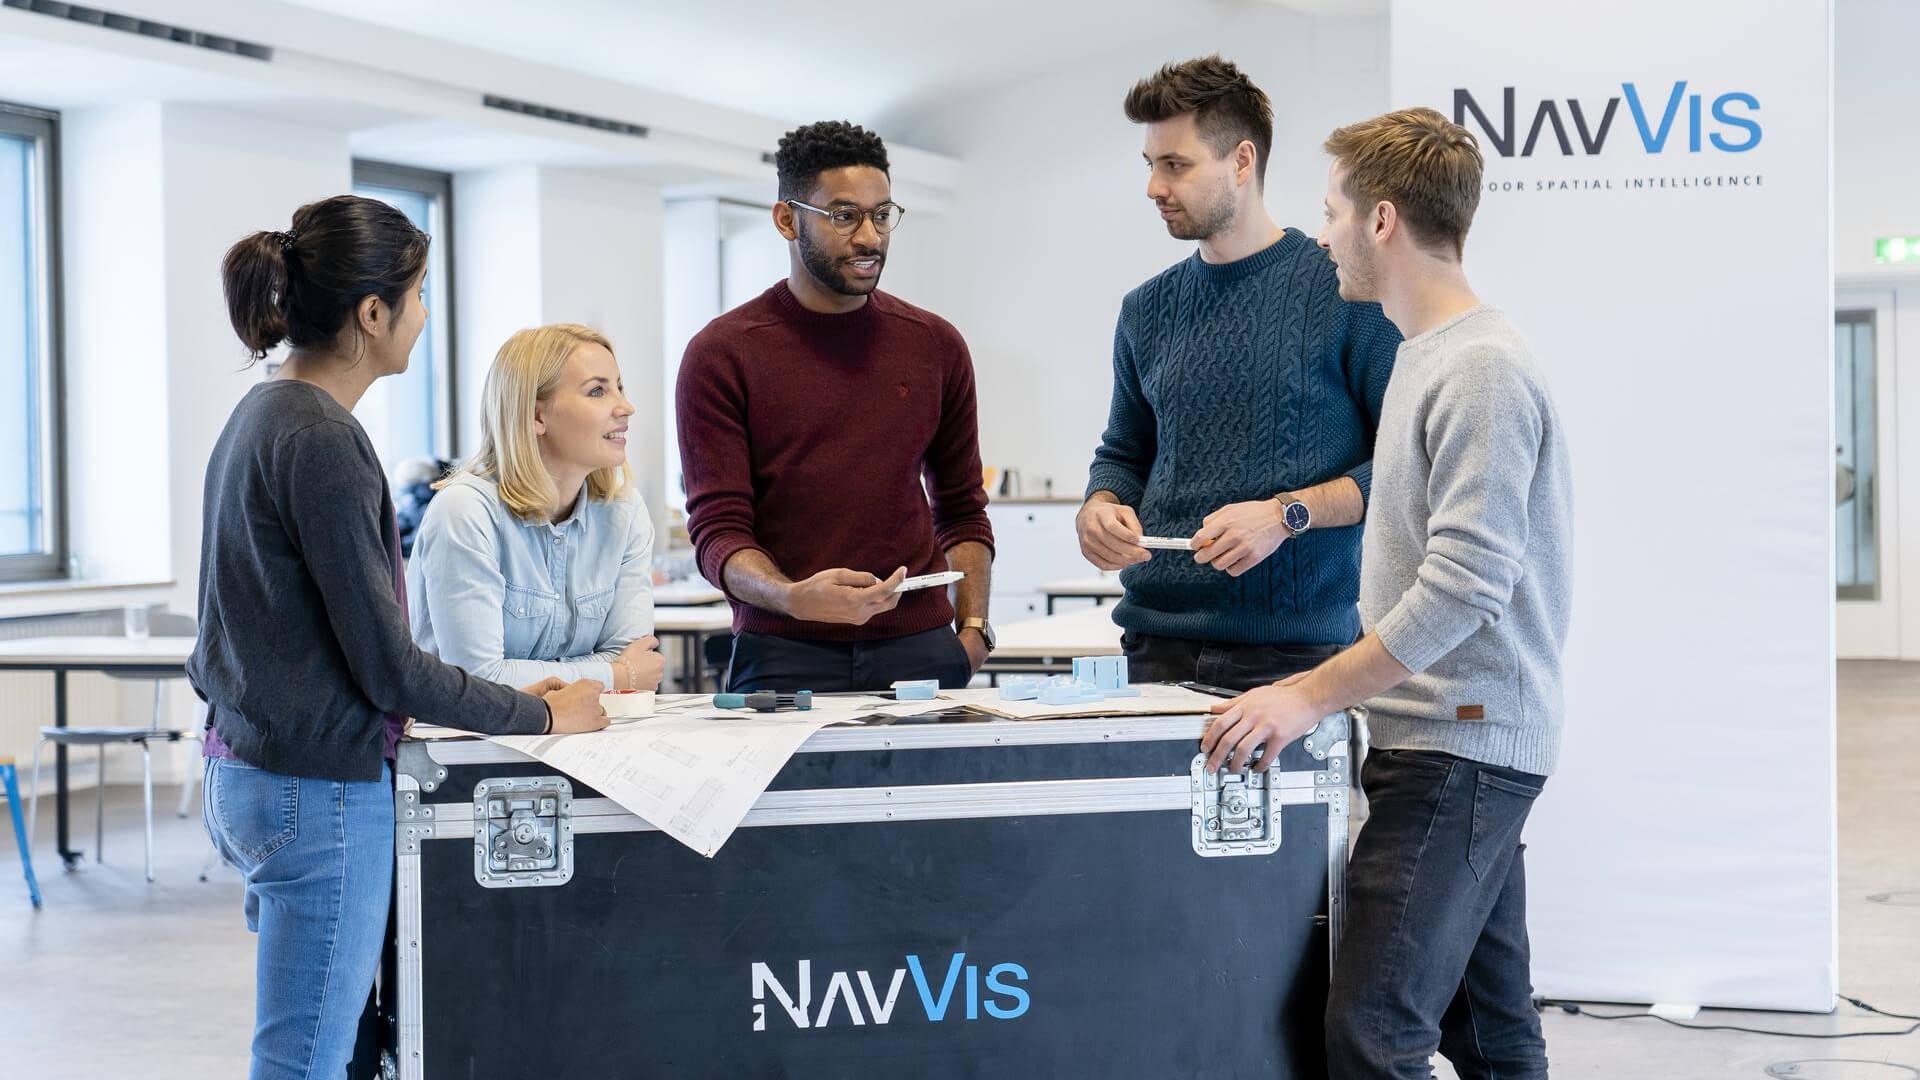 NavVis-people-6838(1)